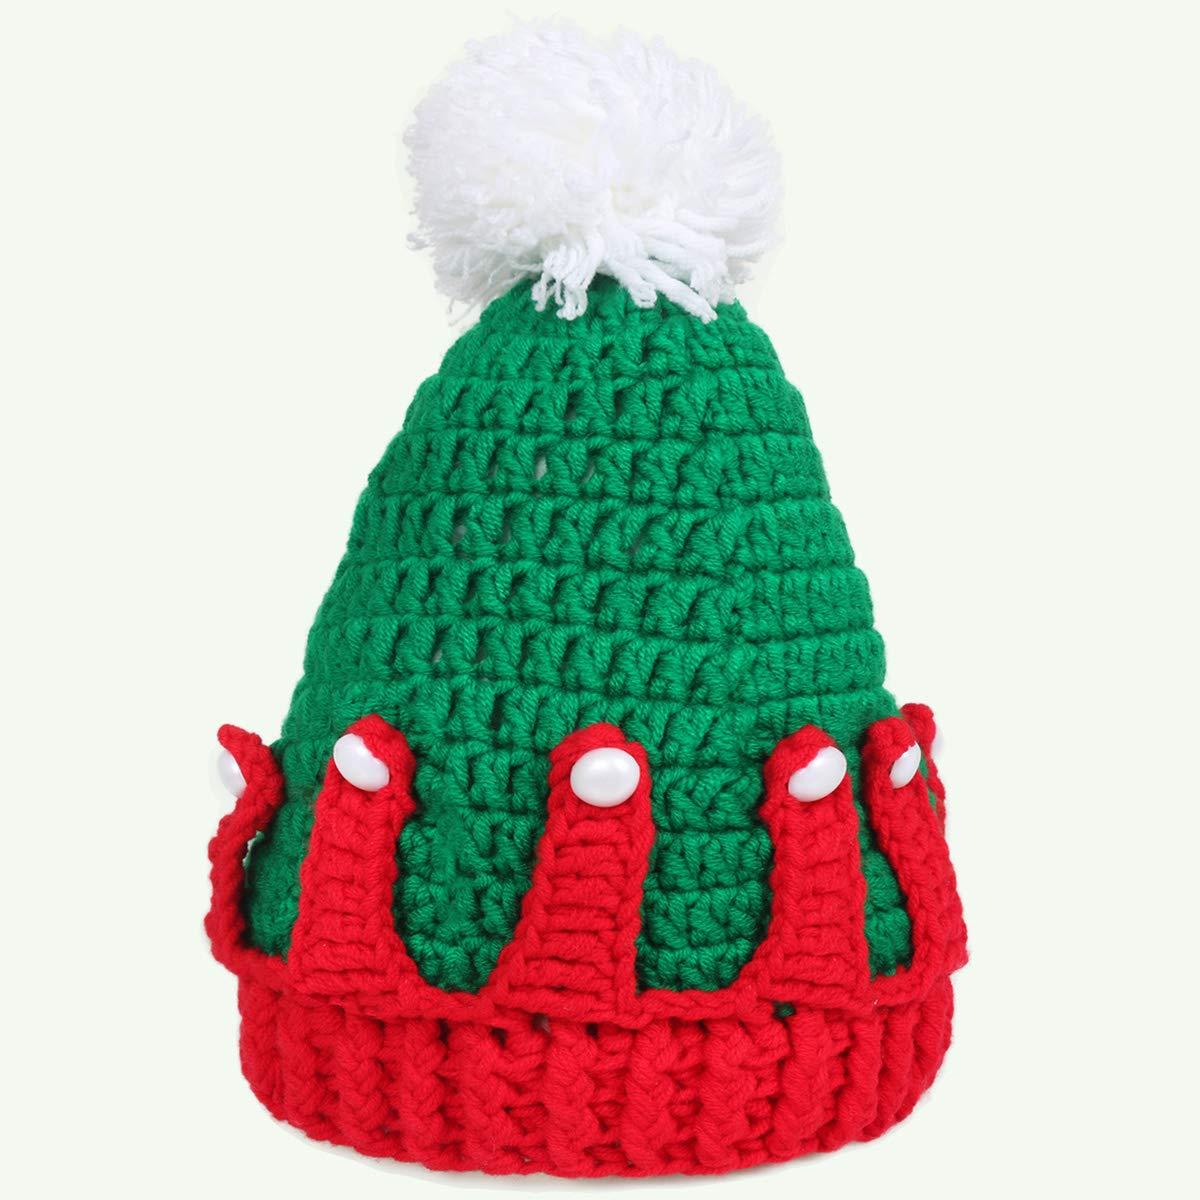 b71c230c173 Amazon.com  Ypser Baby Thanksgiving Christmas Beanie Turkey Knitted Cap Elk  Hat Photo Prop  Clothing